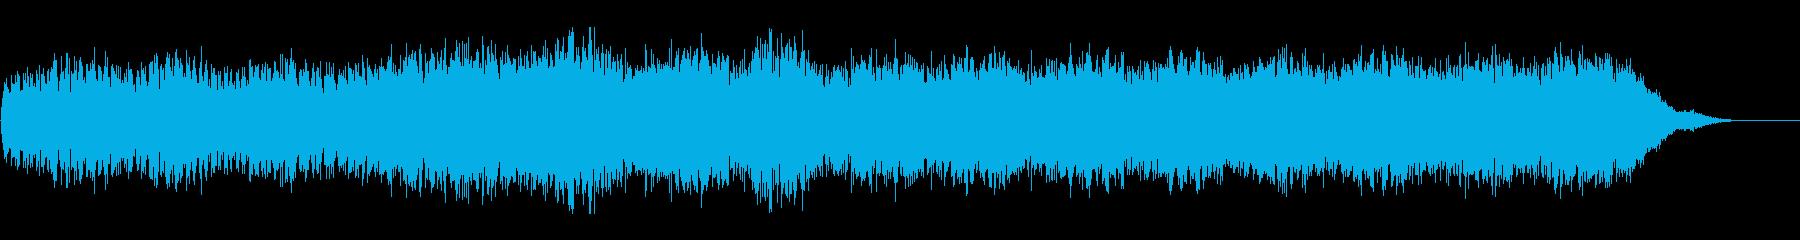 KANTアンビエント混沌200616の再生済みの波形